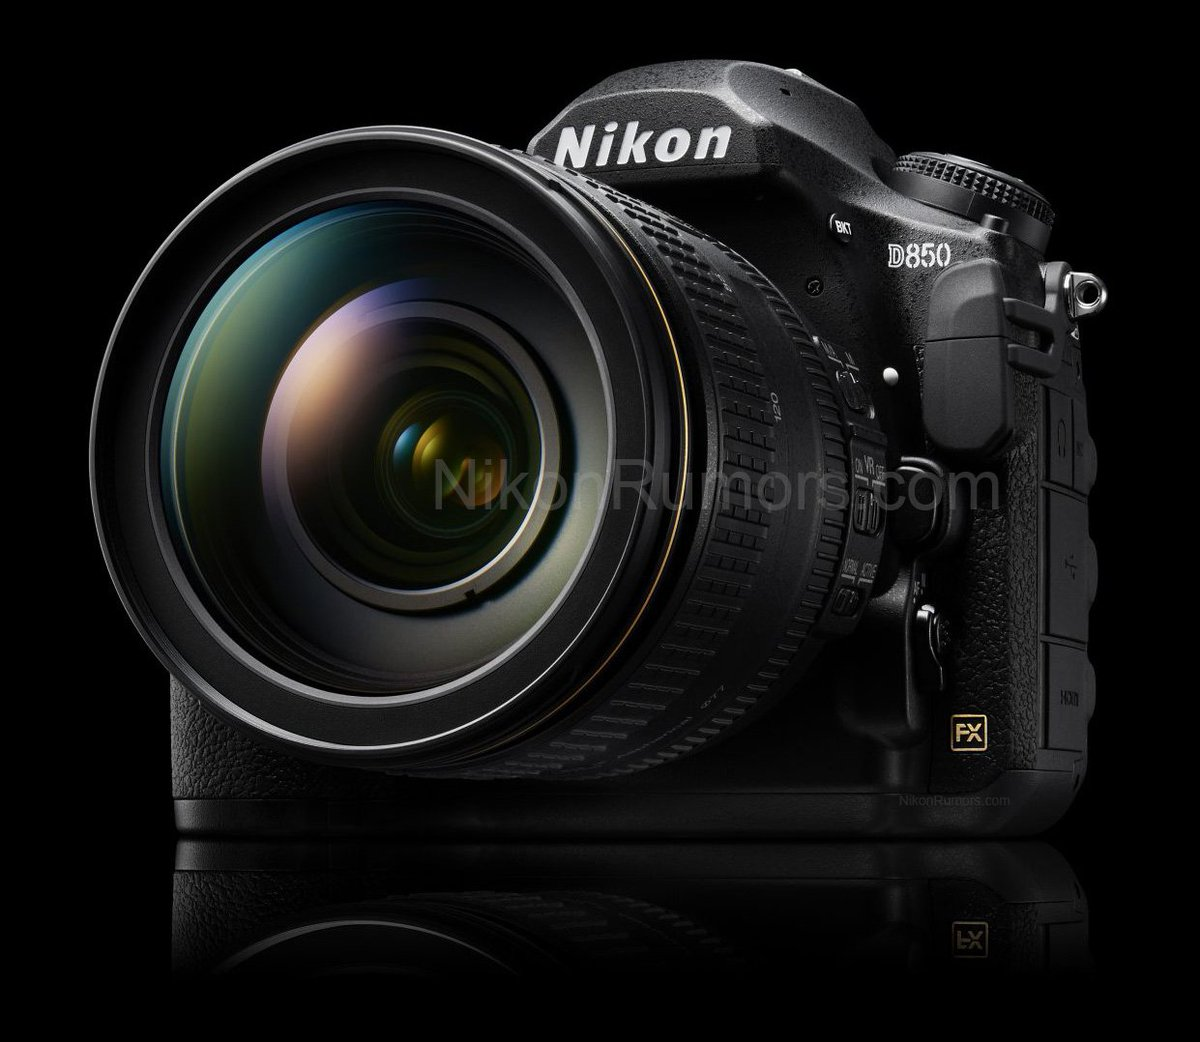 Breaking - first #Nikon #D850 press photos leaked:  https://t.co/EU2weKsVid #nikond850 https://t.co/xBX0vyB4dg